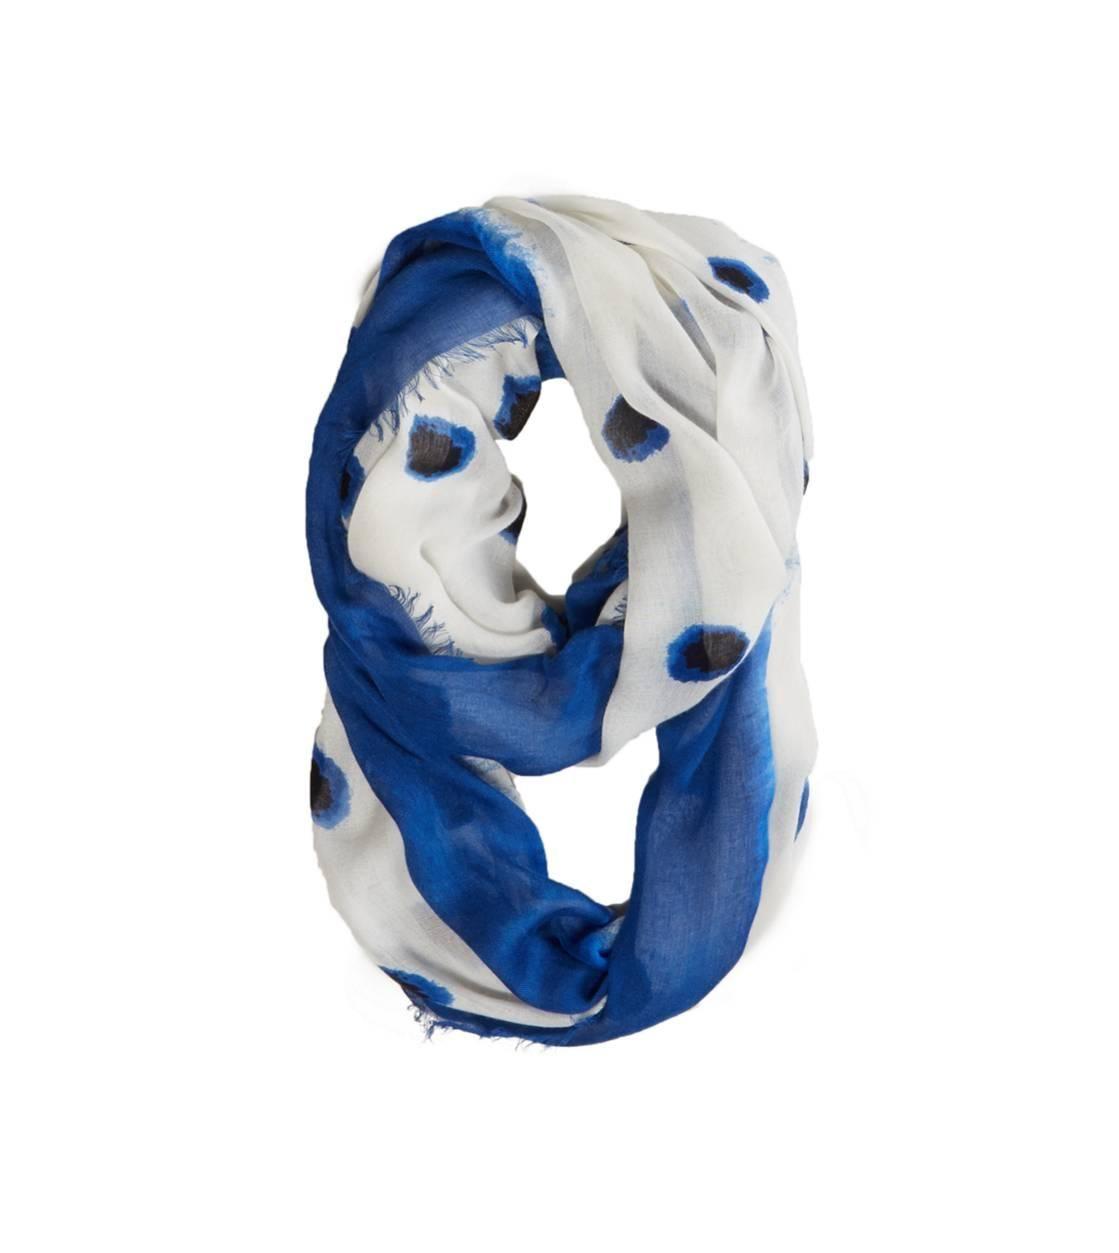 indigo   Blue   Pinterest   Supérieur, Les bleus et Période 97d36e85e41